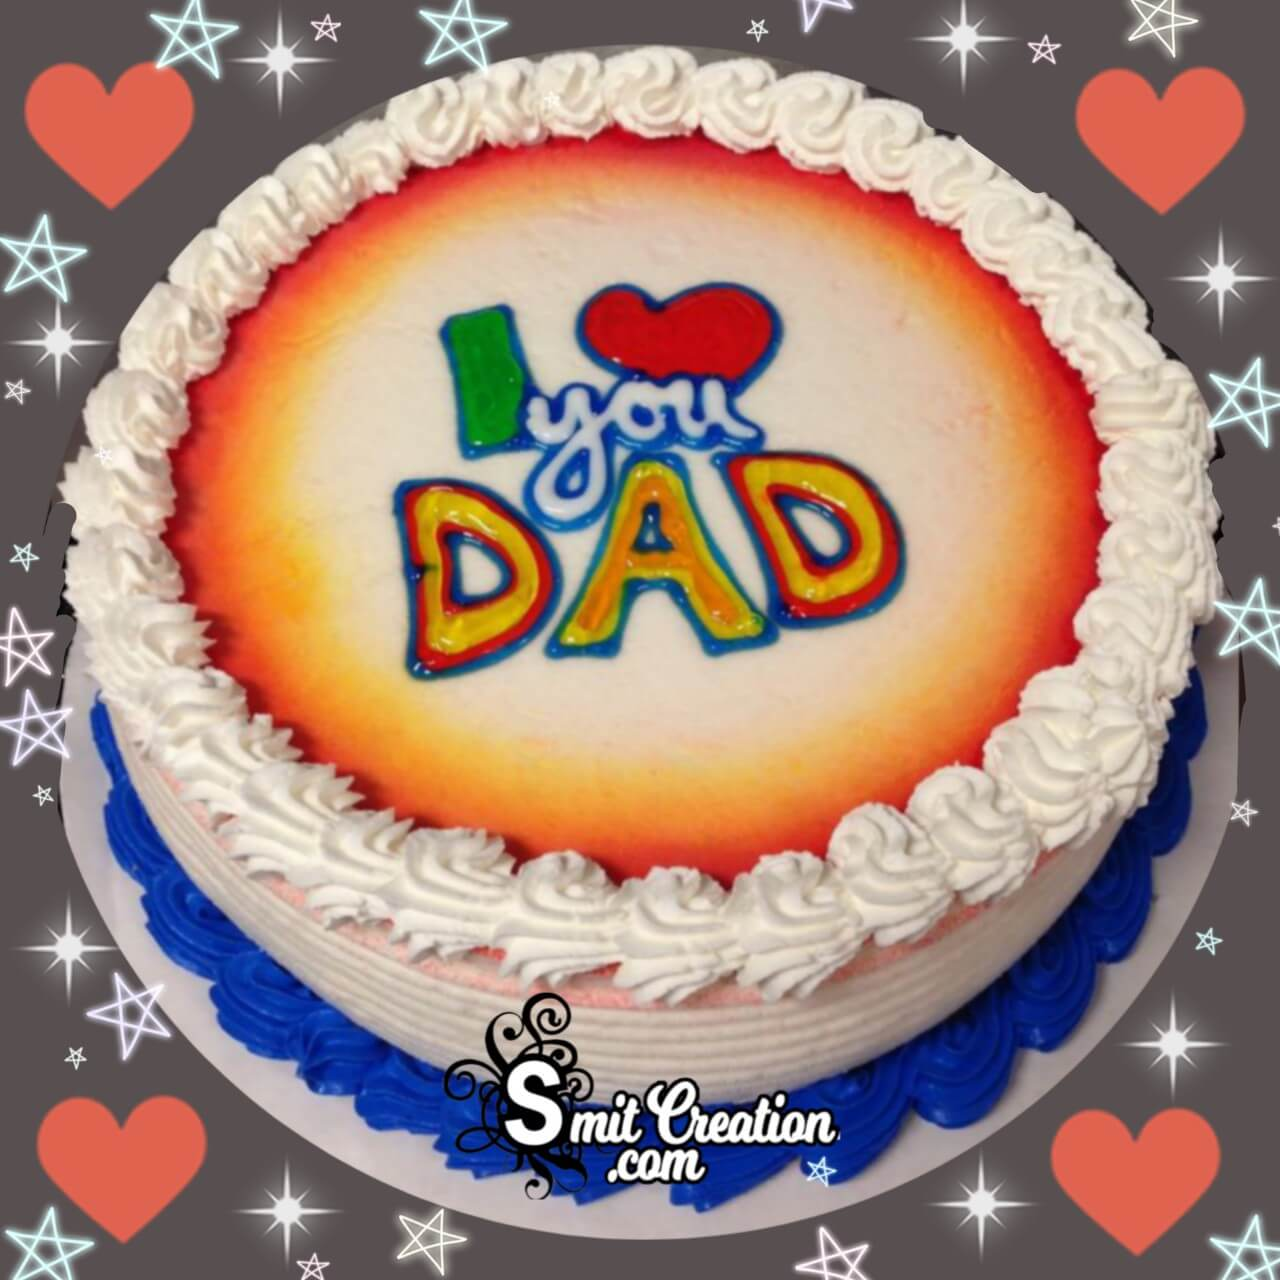 I Love You Dad Cake